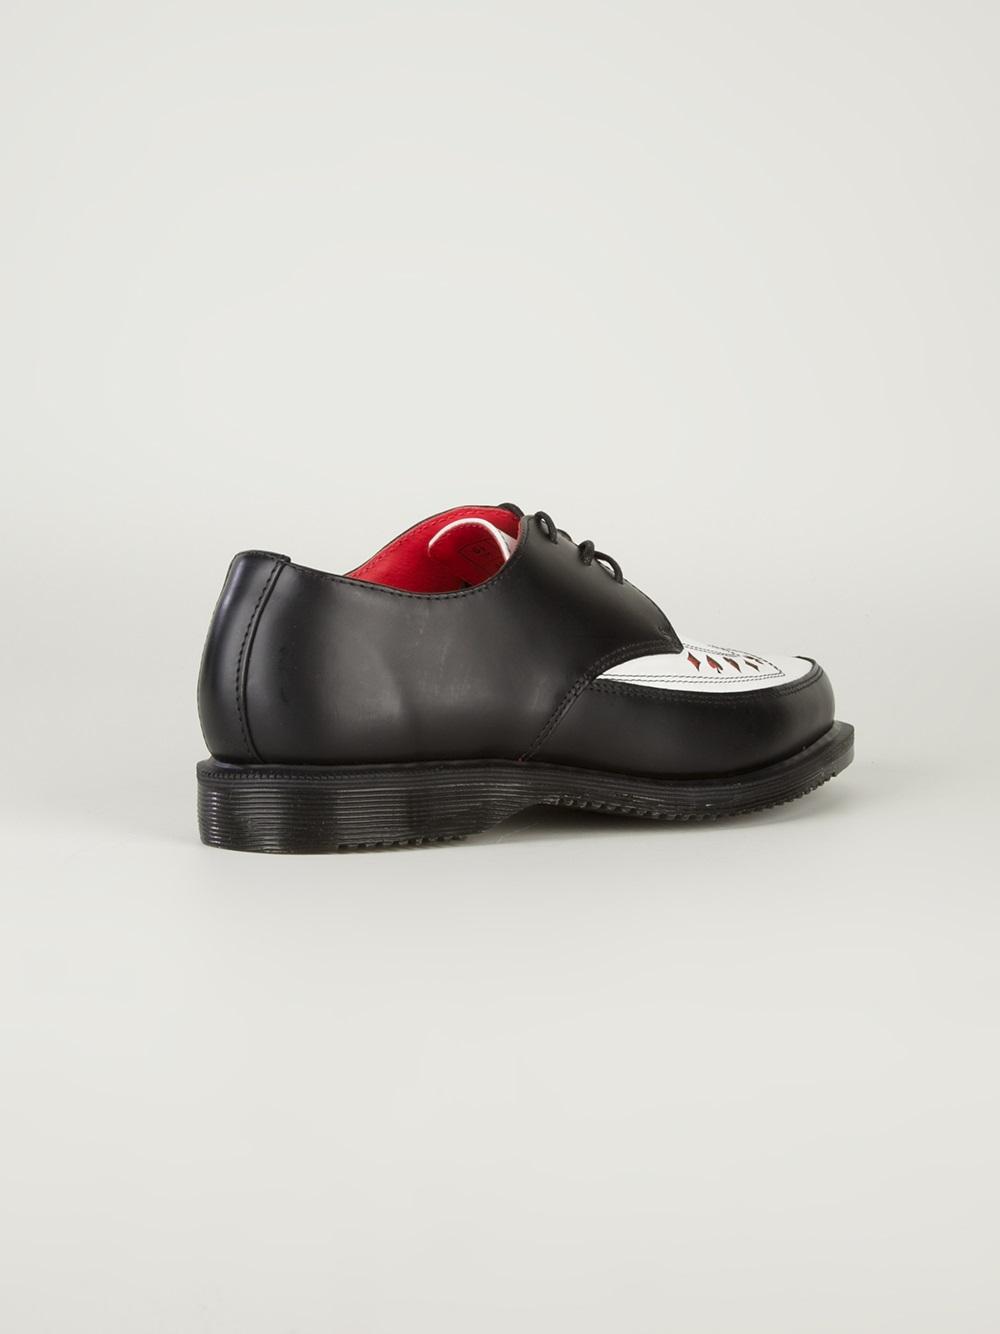 Spurr Shoes True To Size